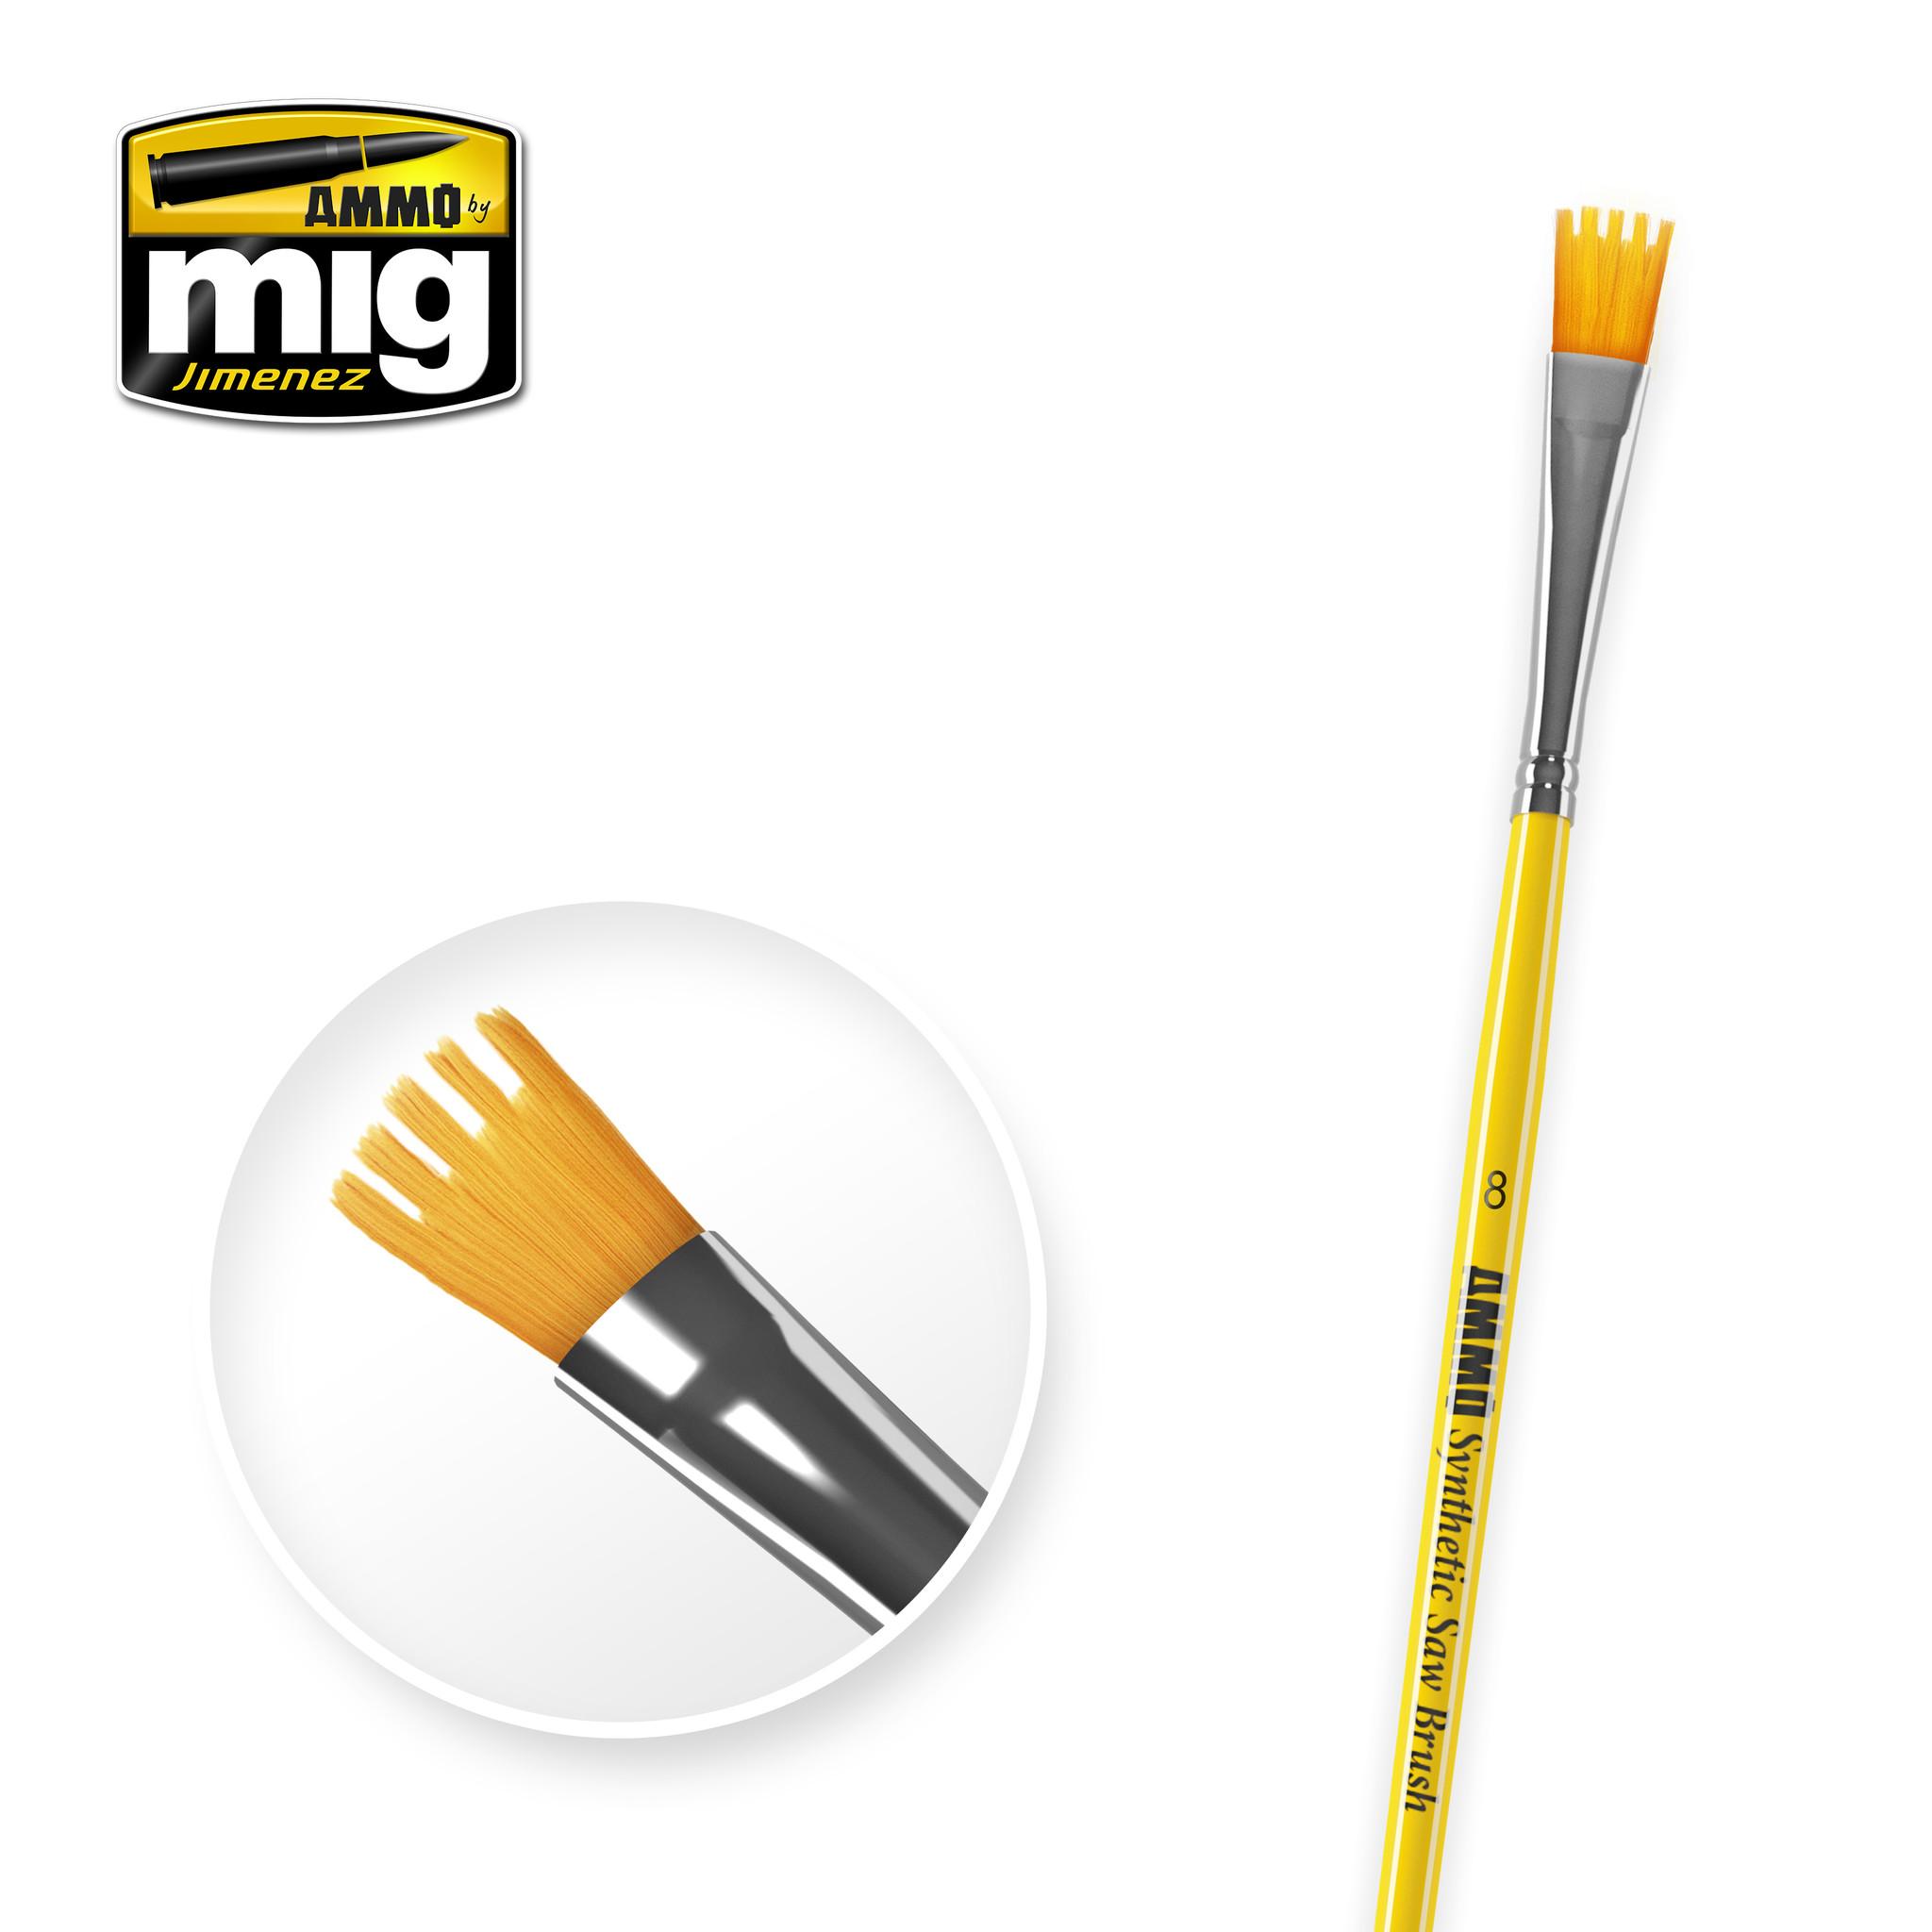 Ammo by Mig Jimenez 8 Syntetic Saw Brush - A.MIG-8585